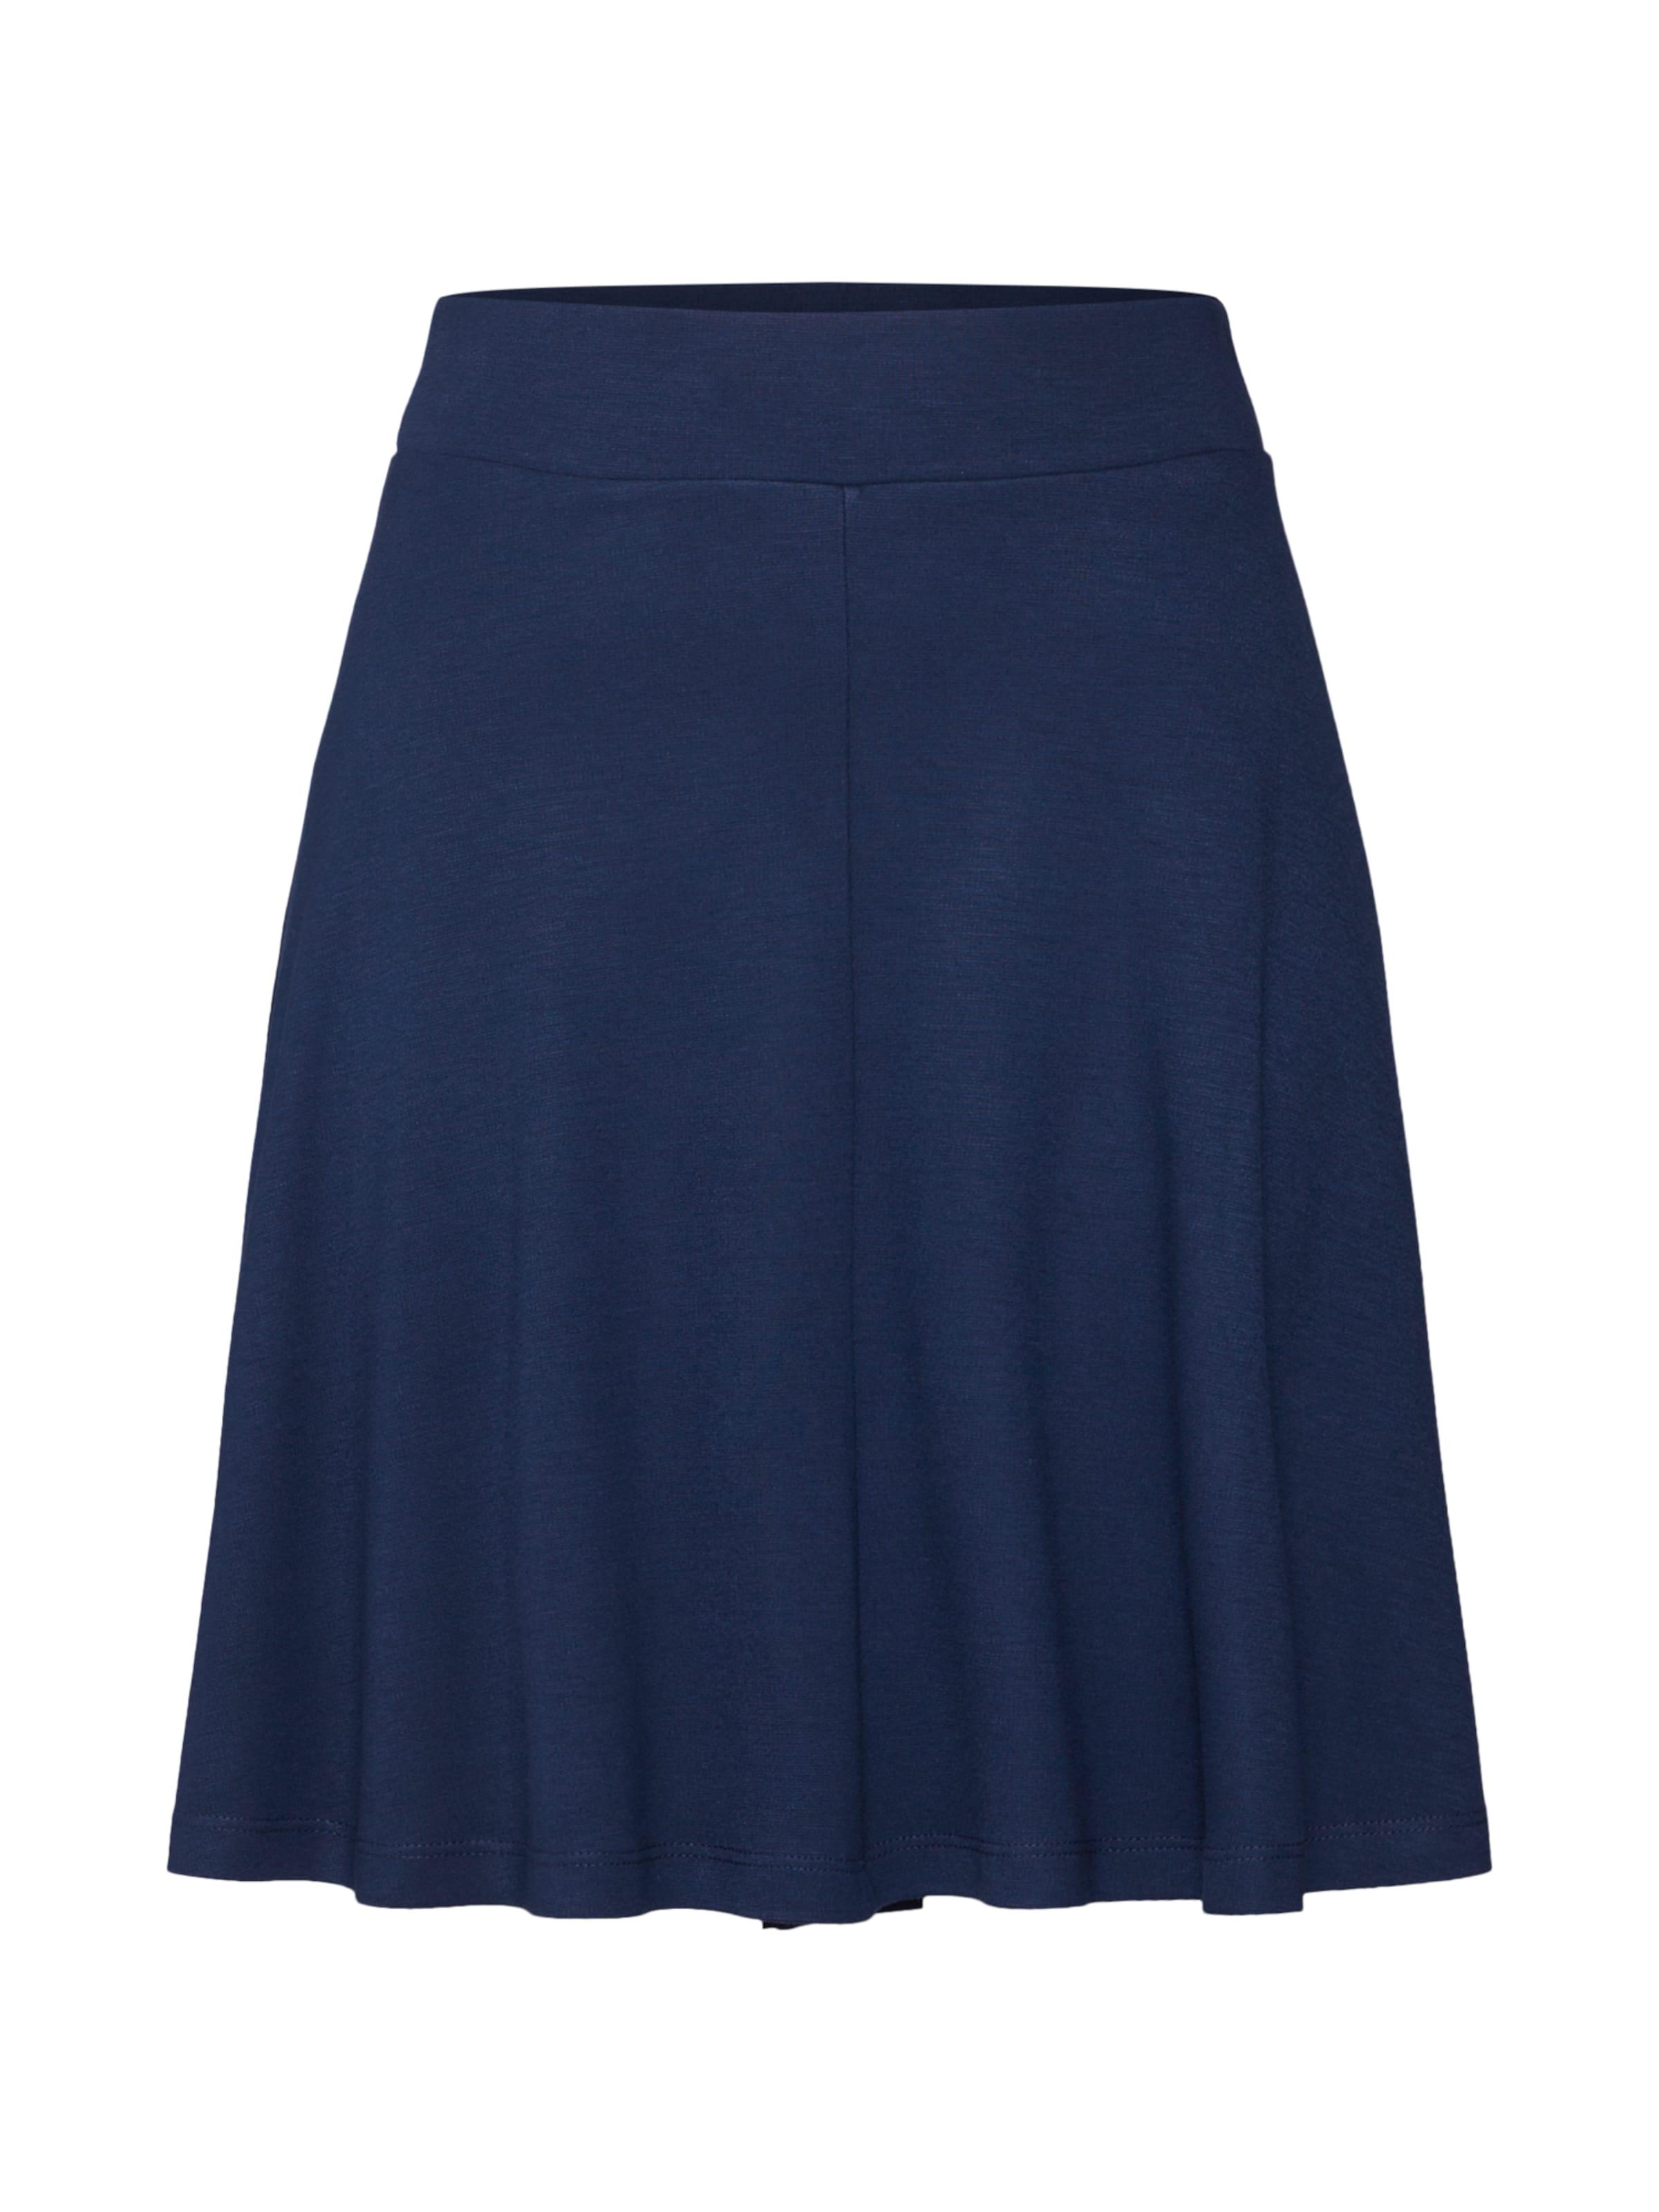 En Bleu Marine Esprit En Jupe Bleu Jupe Jupe Esprit Esprit Marine En 1FKcJl